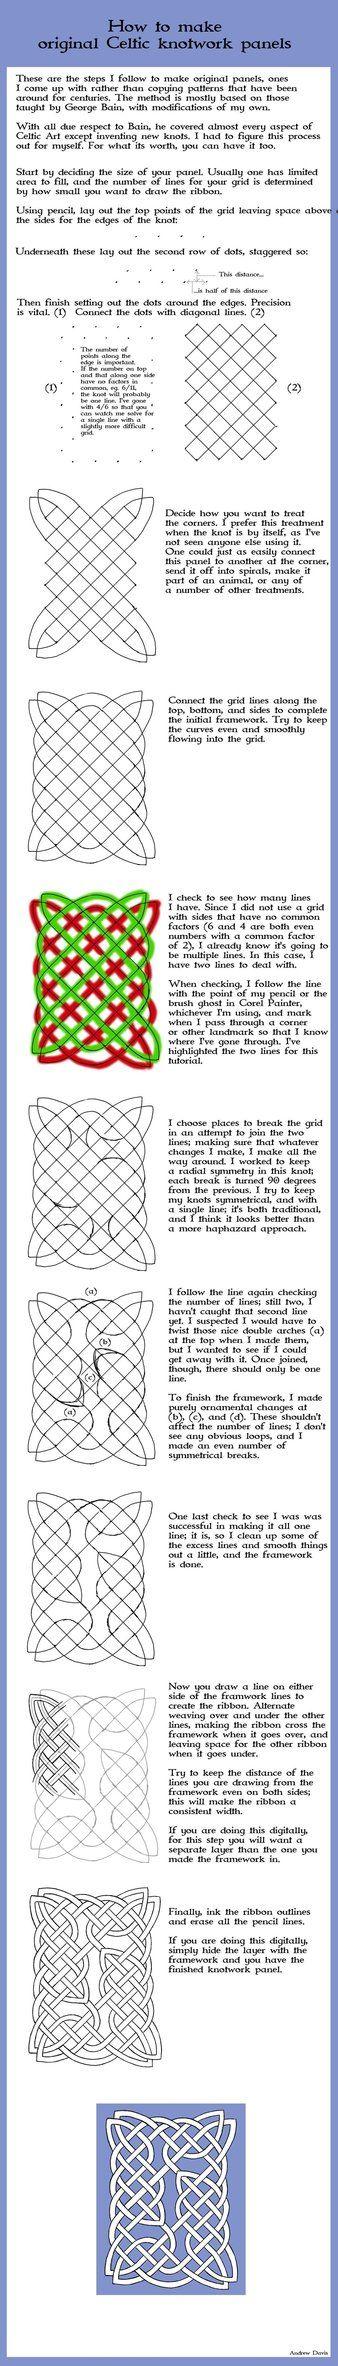 Andrew Davis - Dibujar Nudos Celtas - 03 | dibujo | Pinterest ...